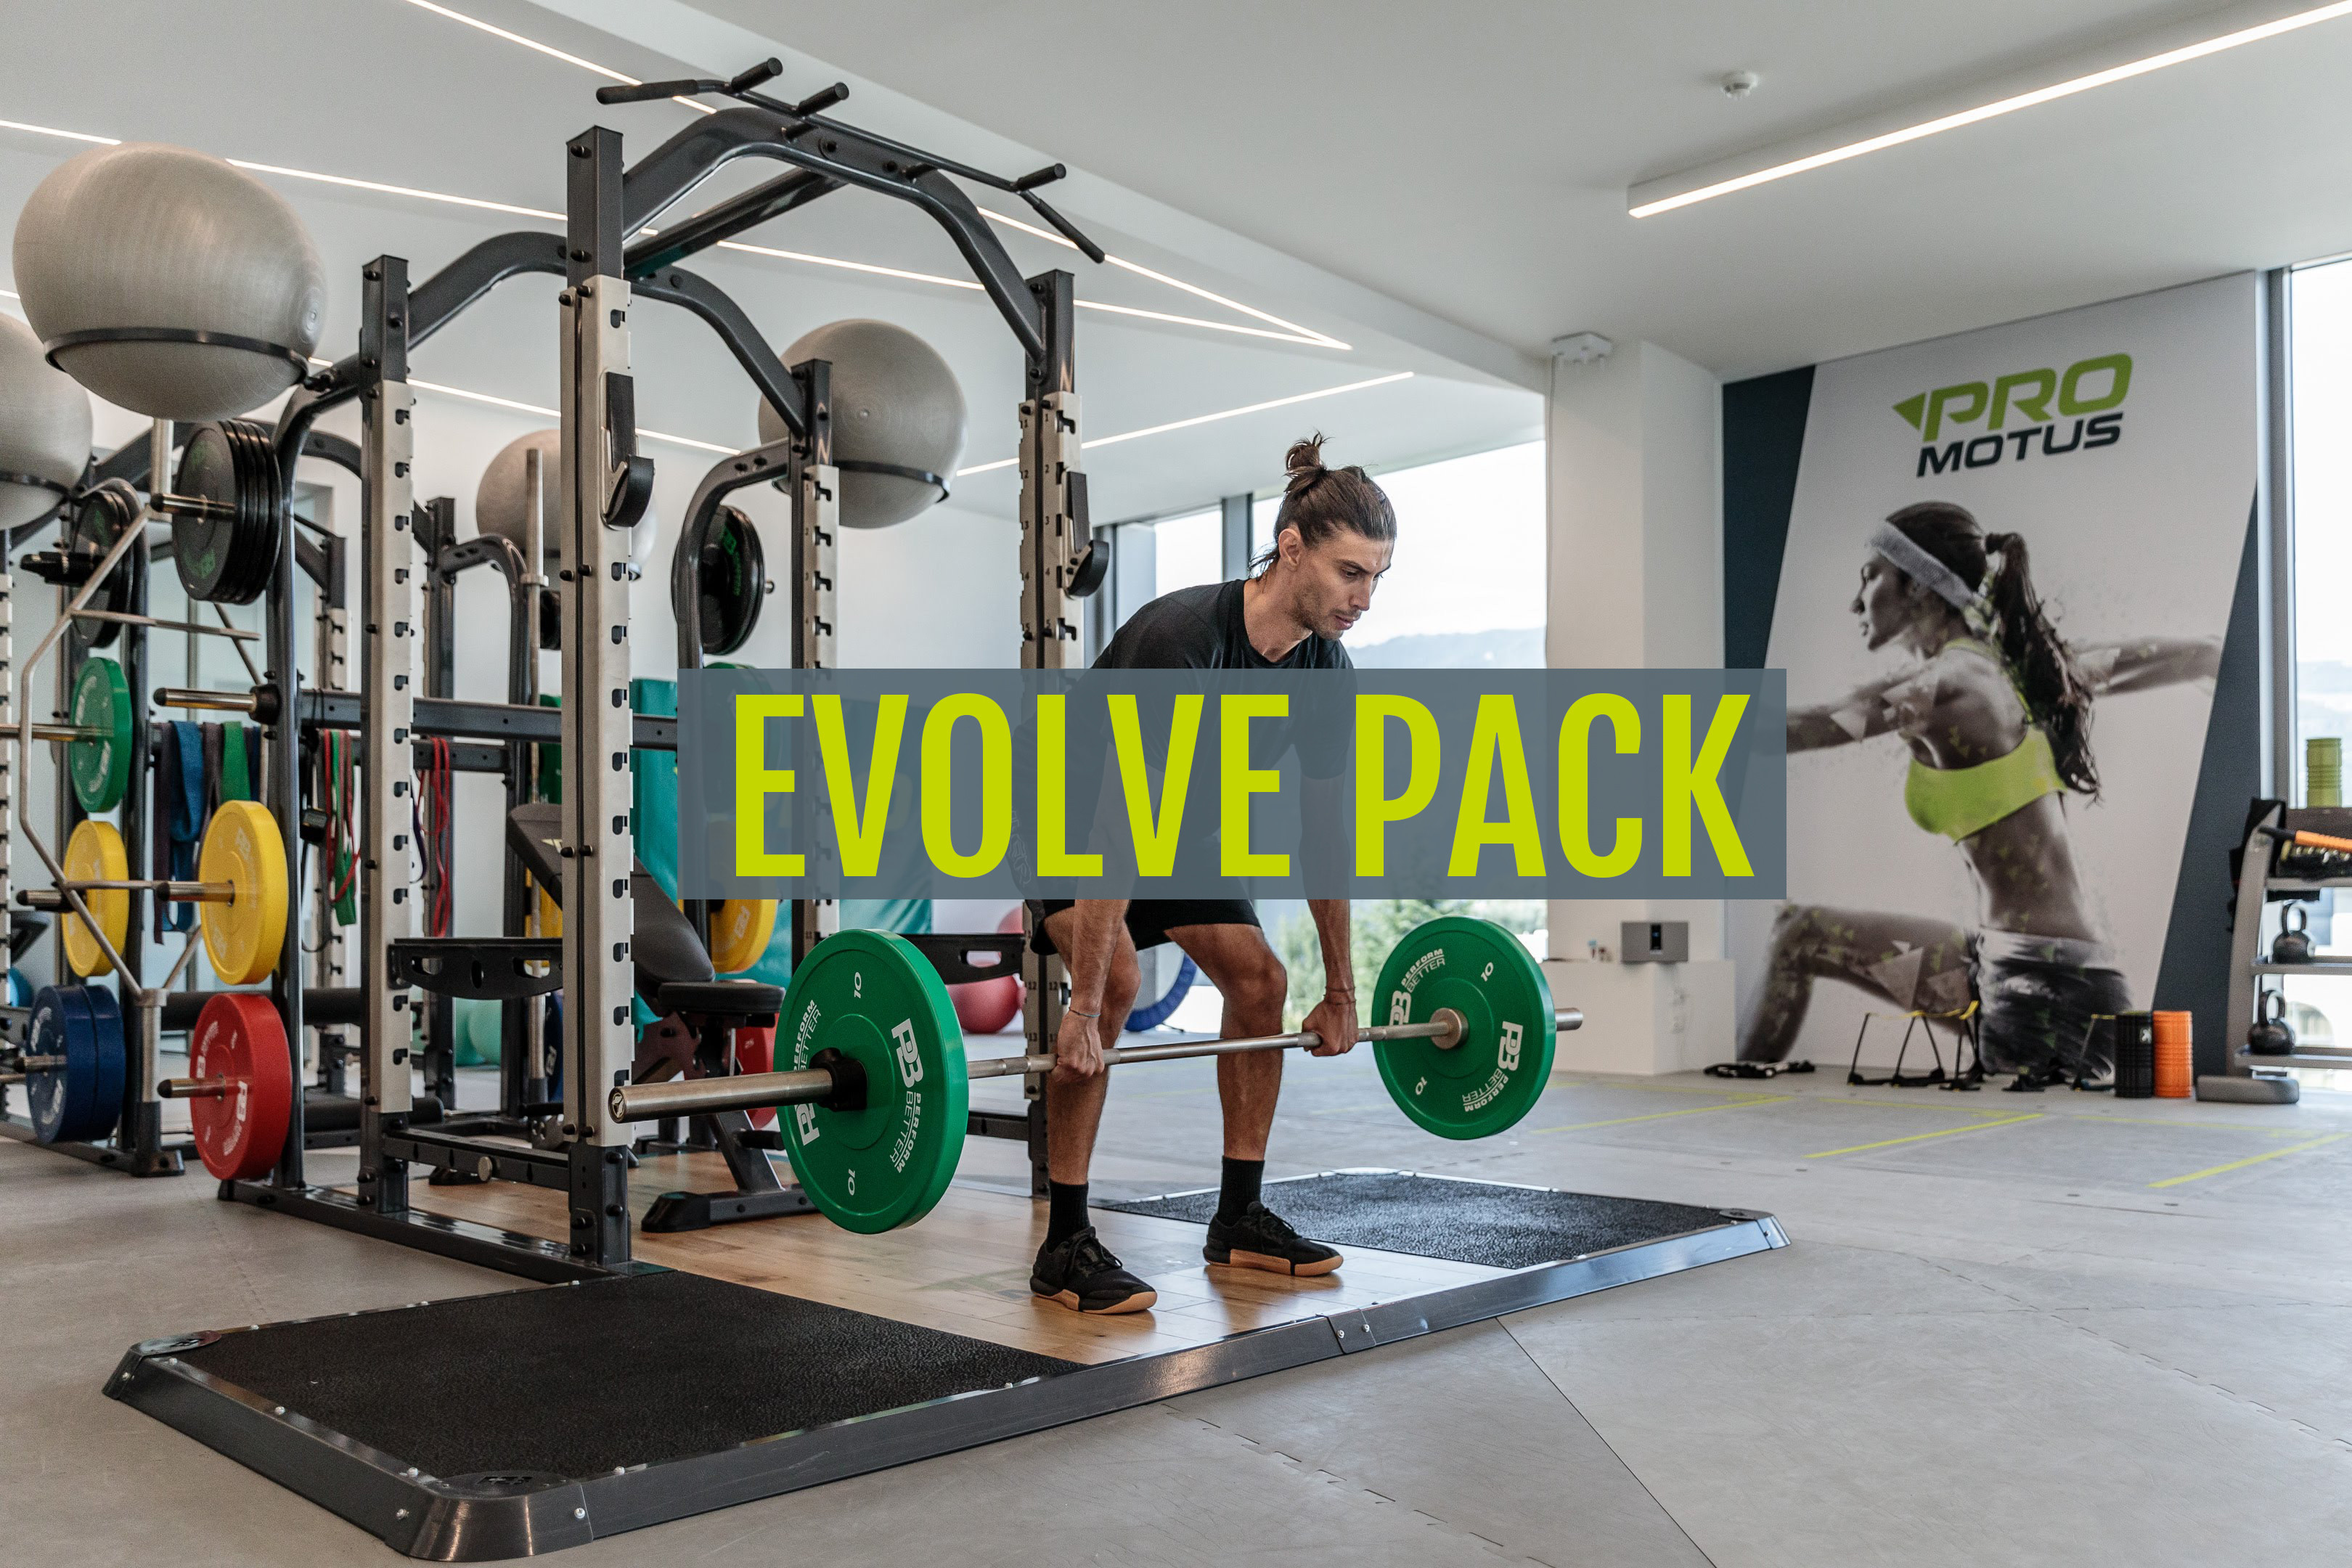 Snowboard - Evolve Pack